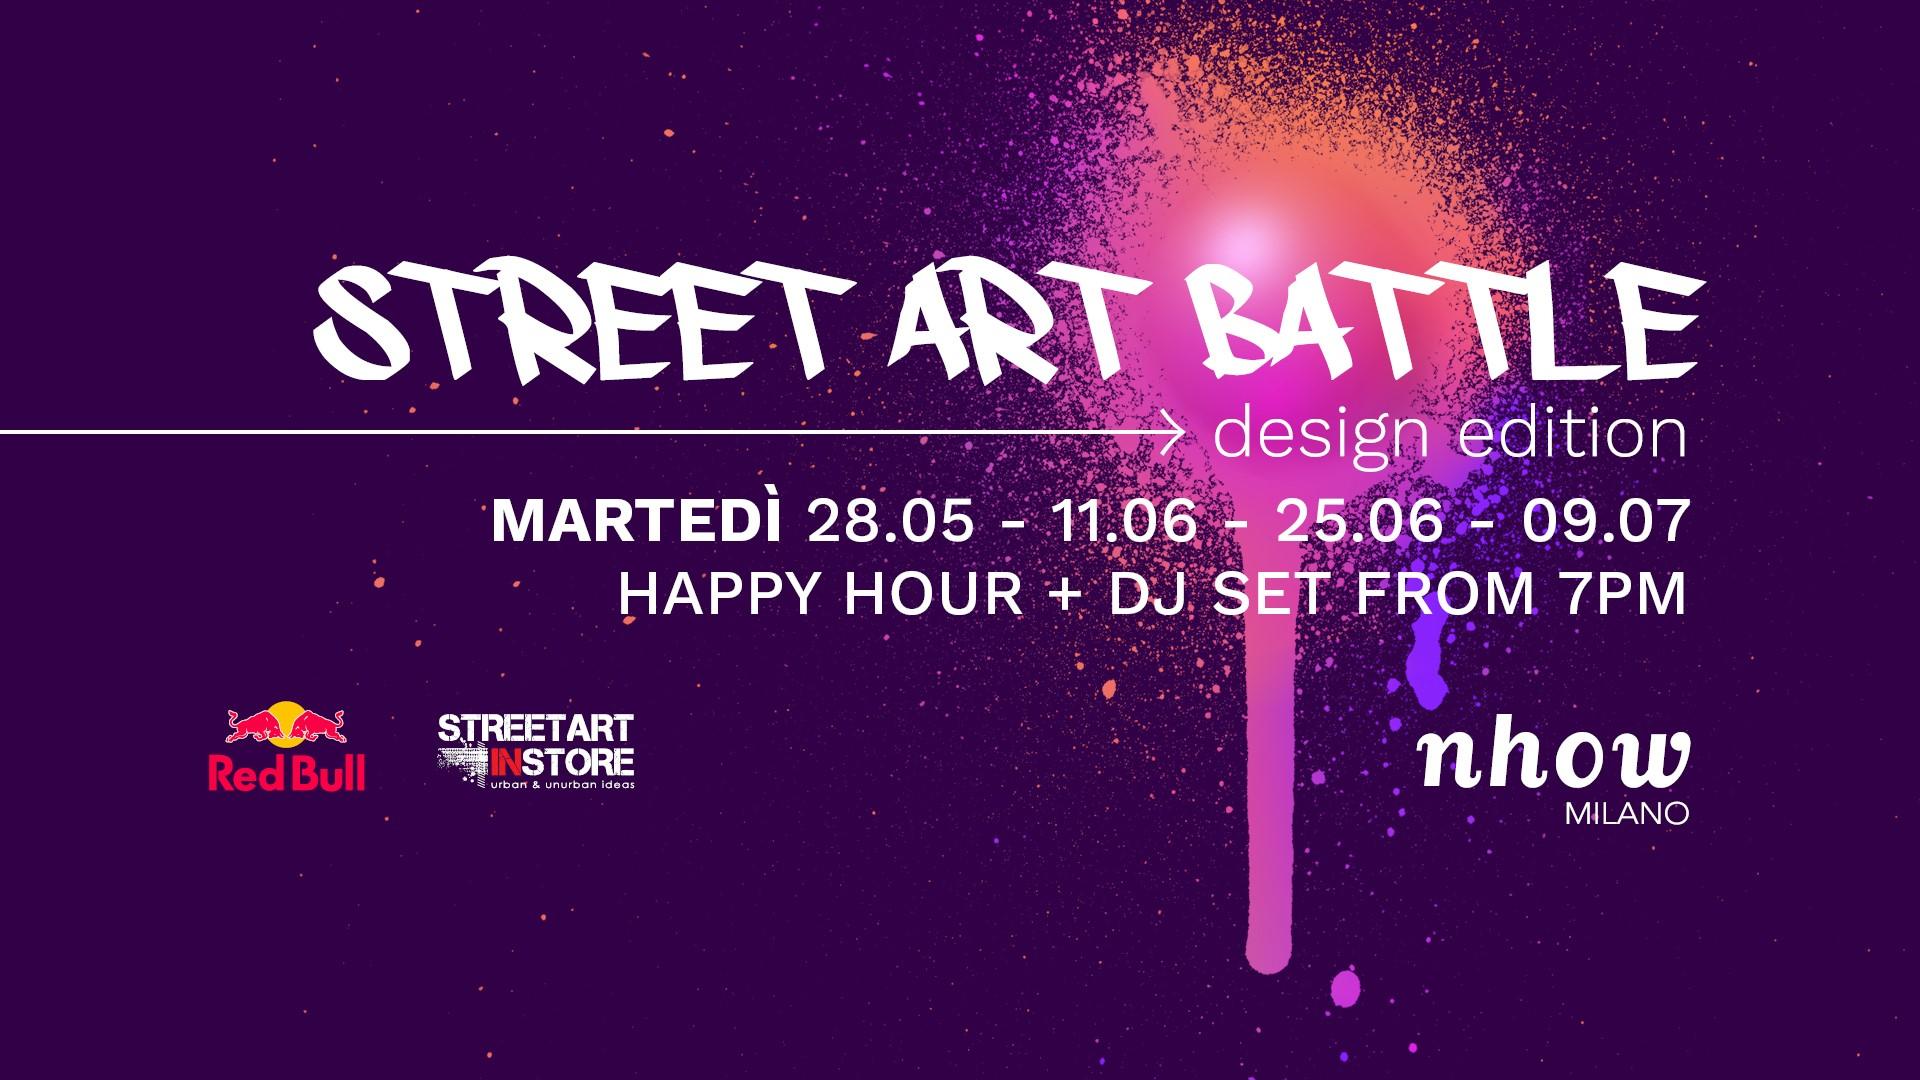 NHow Hotel | Terrace Party & Street Art Battle | YOUparti ingresso omaggio free